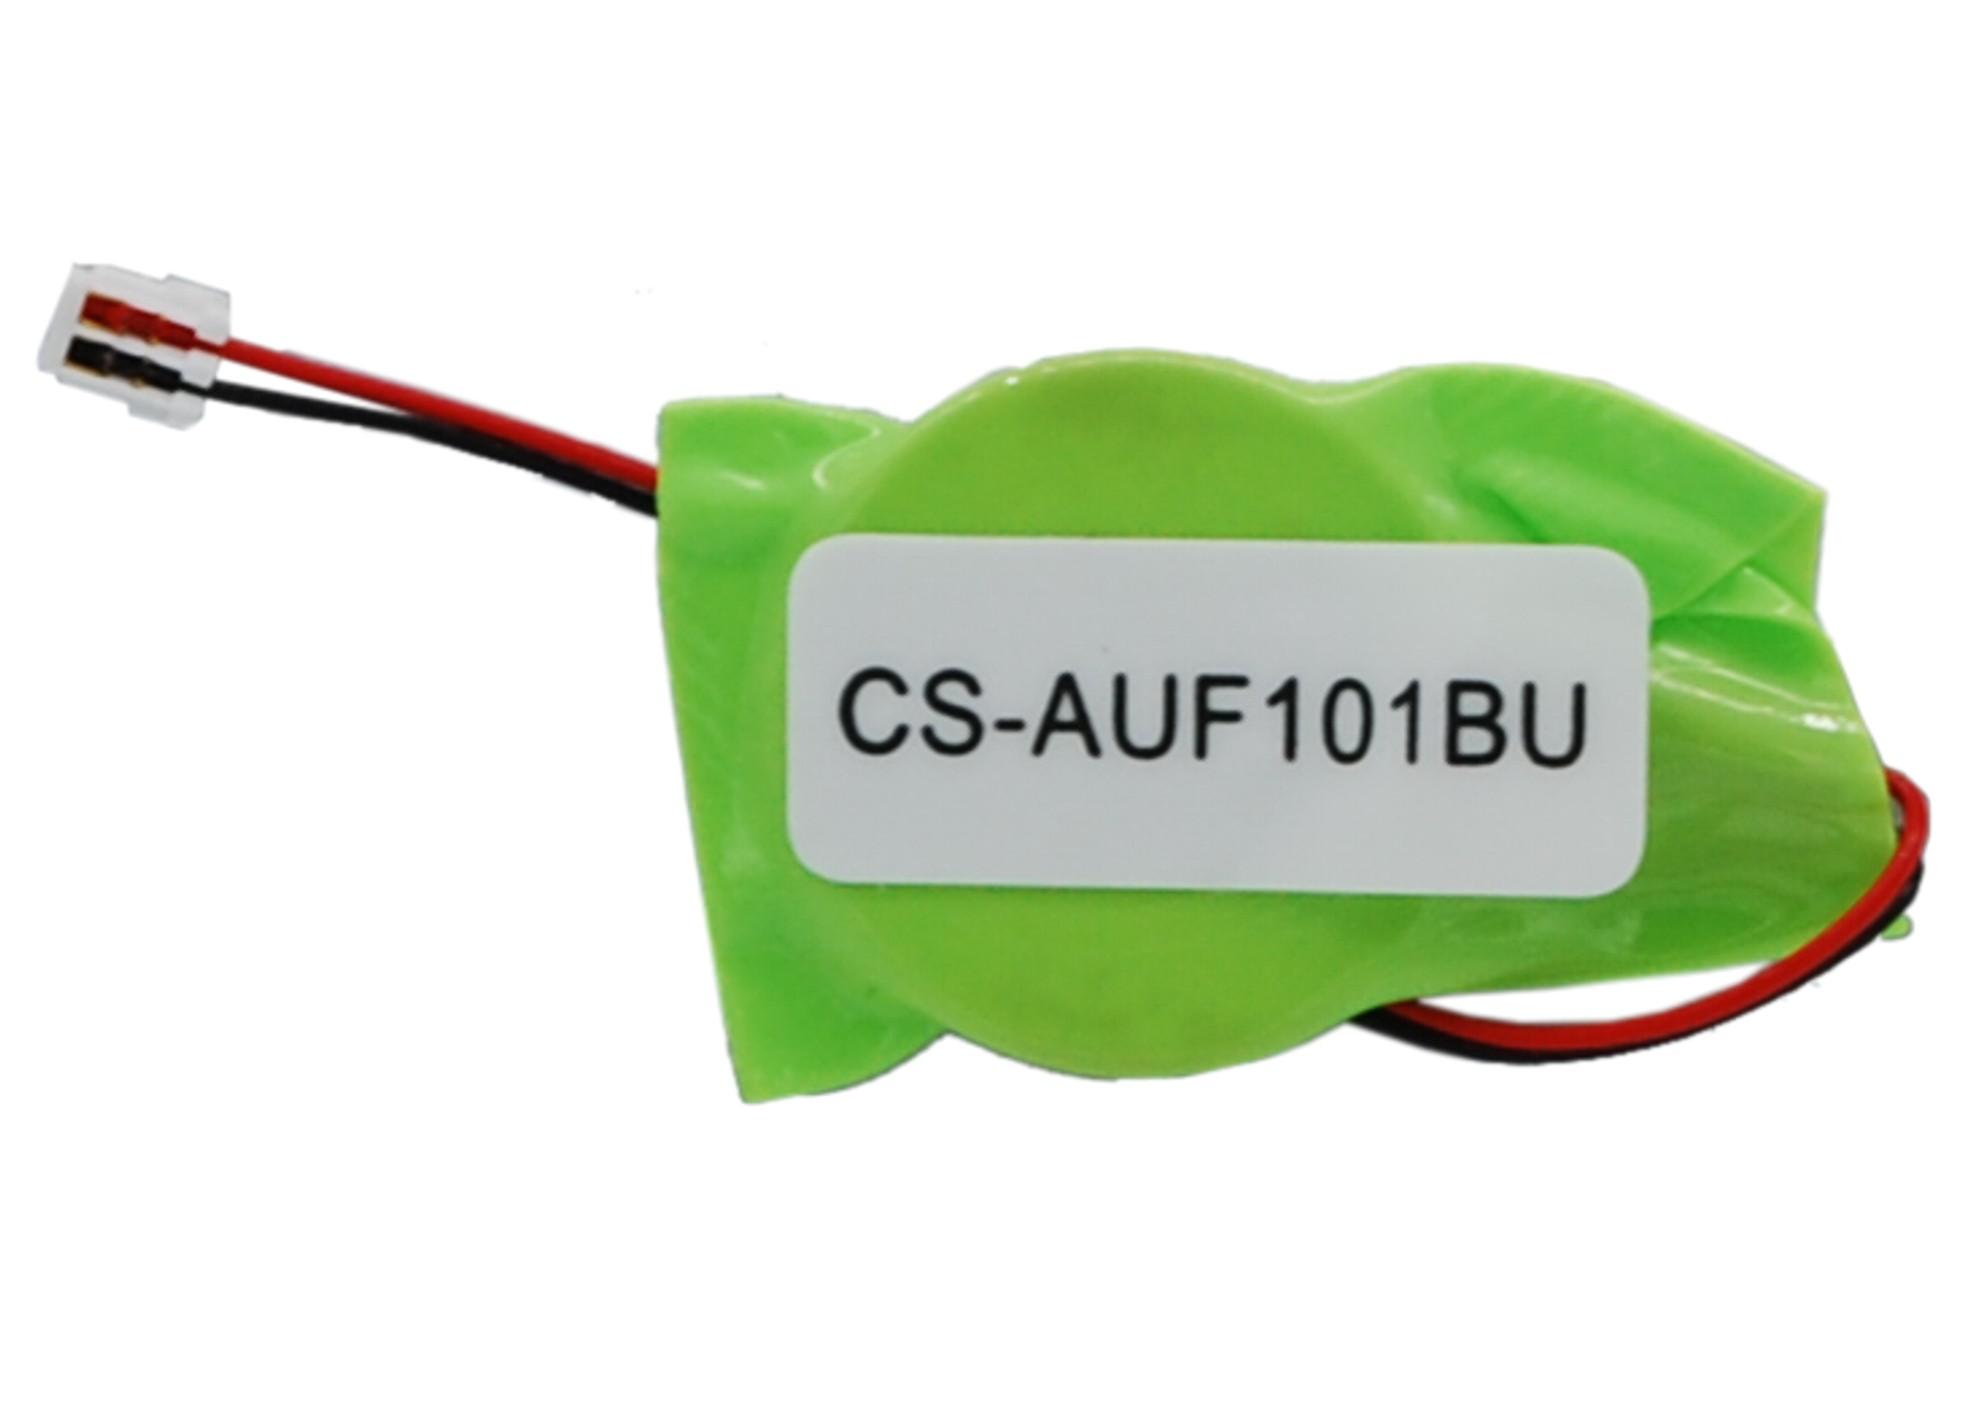 Cameron Sino baterie cmos pro ASUS Eee Pad Transformer TF101-1B026A 3V Li-ion 40mAh zelená - neoriginální